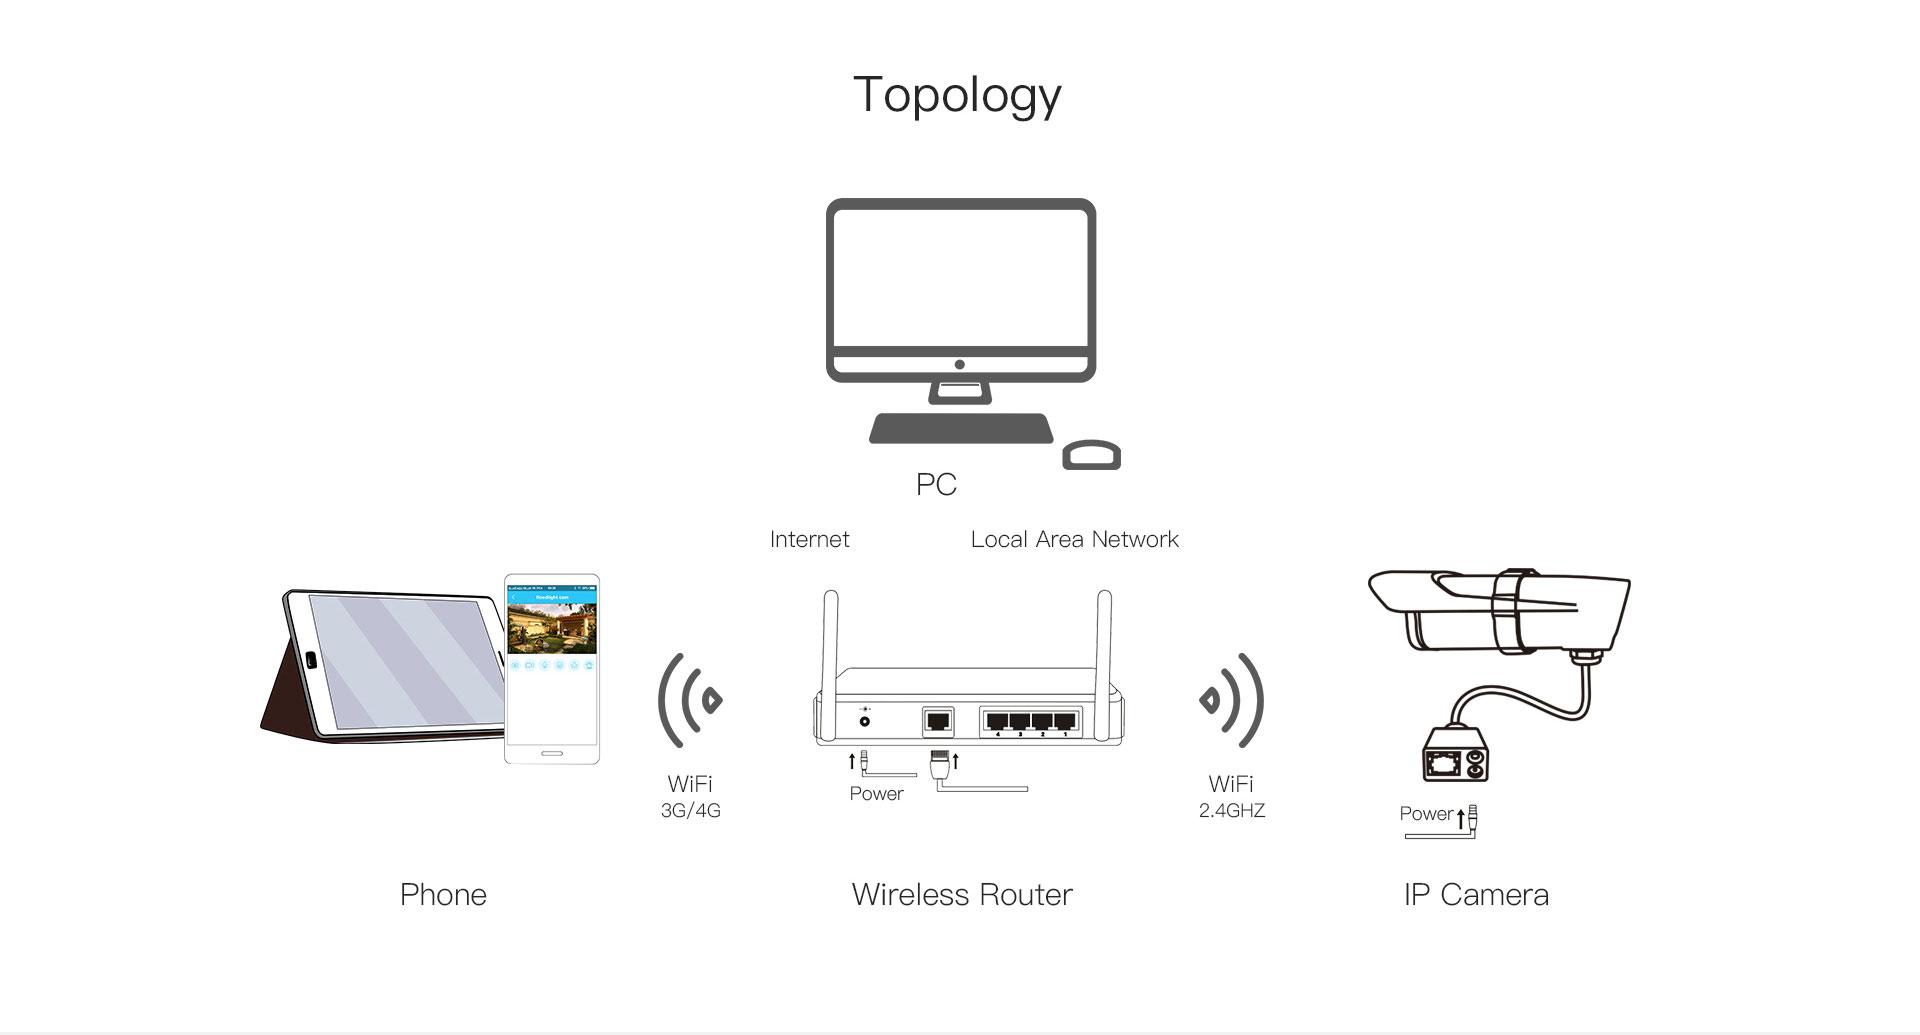 ip camera c16s topology